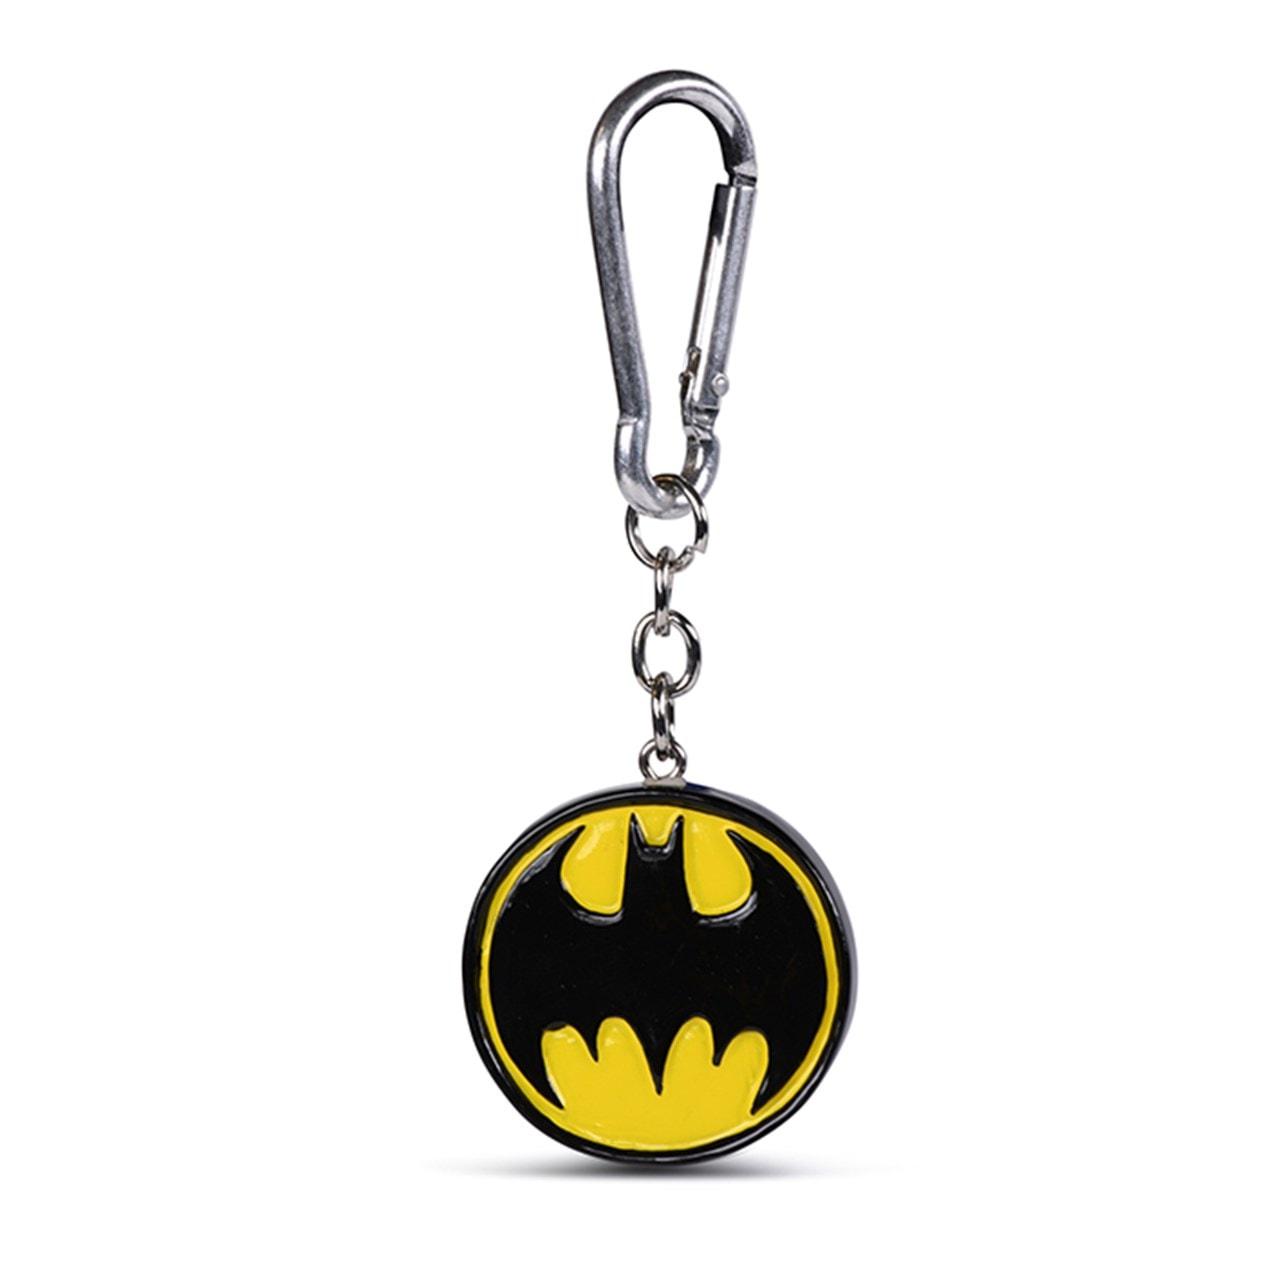 Batman Logo 3D Keychain - 1